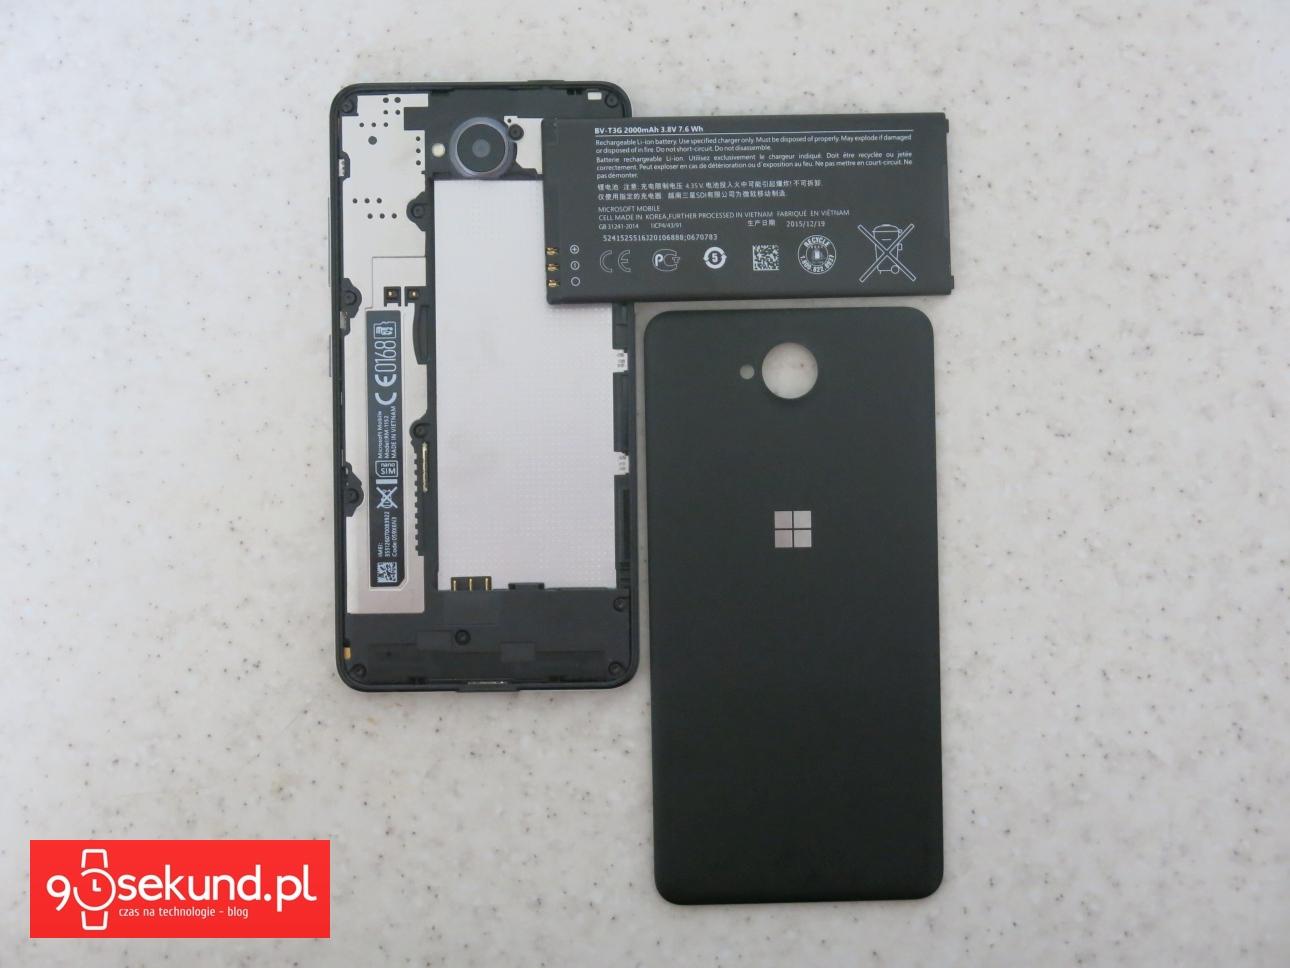 Microsoft Lumia 650 - recenzja na 90sekund.pl